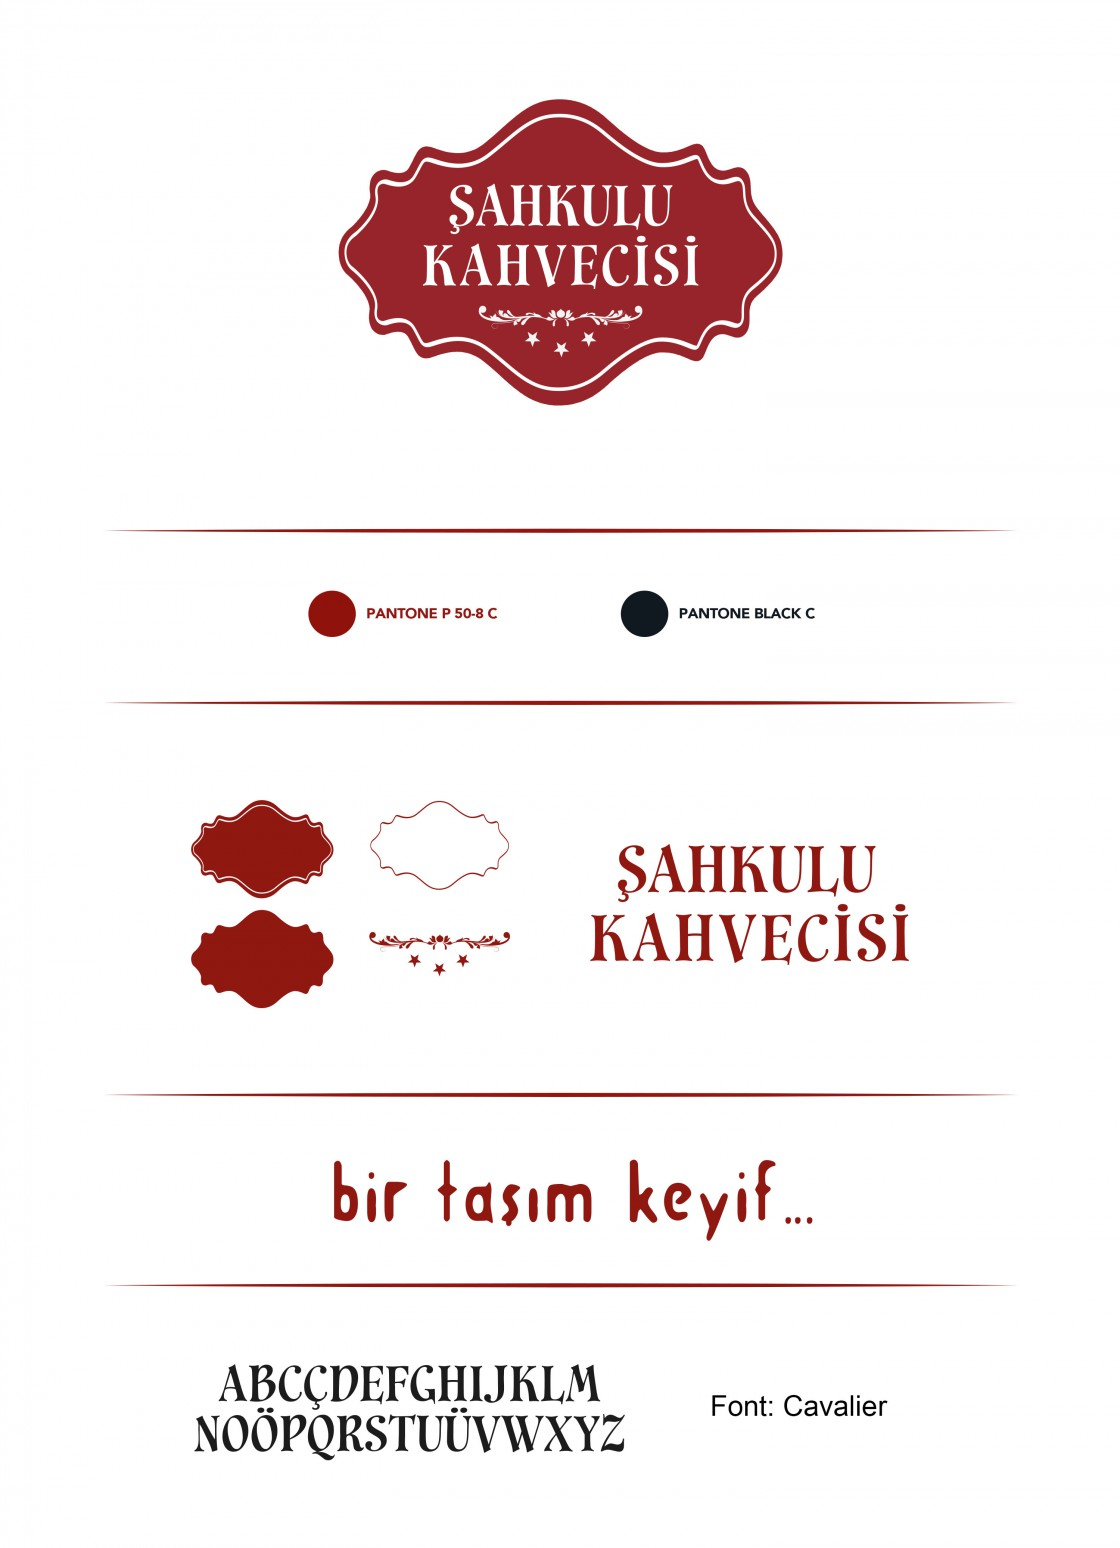 Nar_Turizm_19_sahkulu_kahvecisi_logo_tasarimi